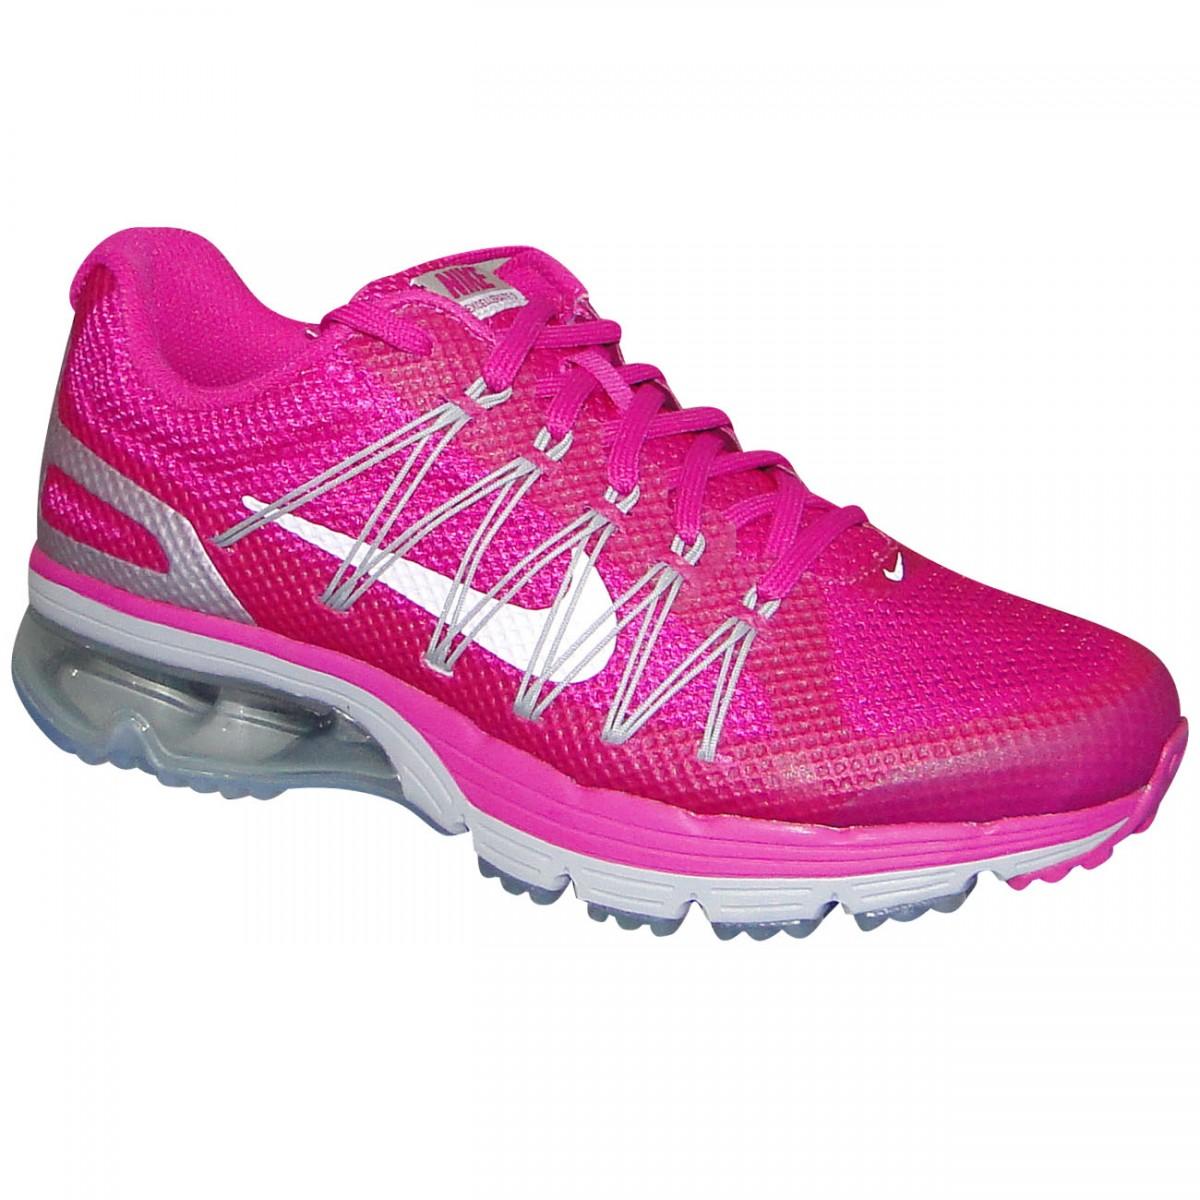 da0cf7f8e6 Tenis Nike Air Max Excellerate 3 703073-500 - Lilas Cinza - Chuteira ...